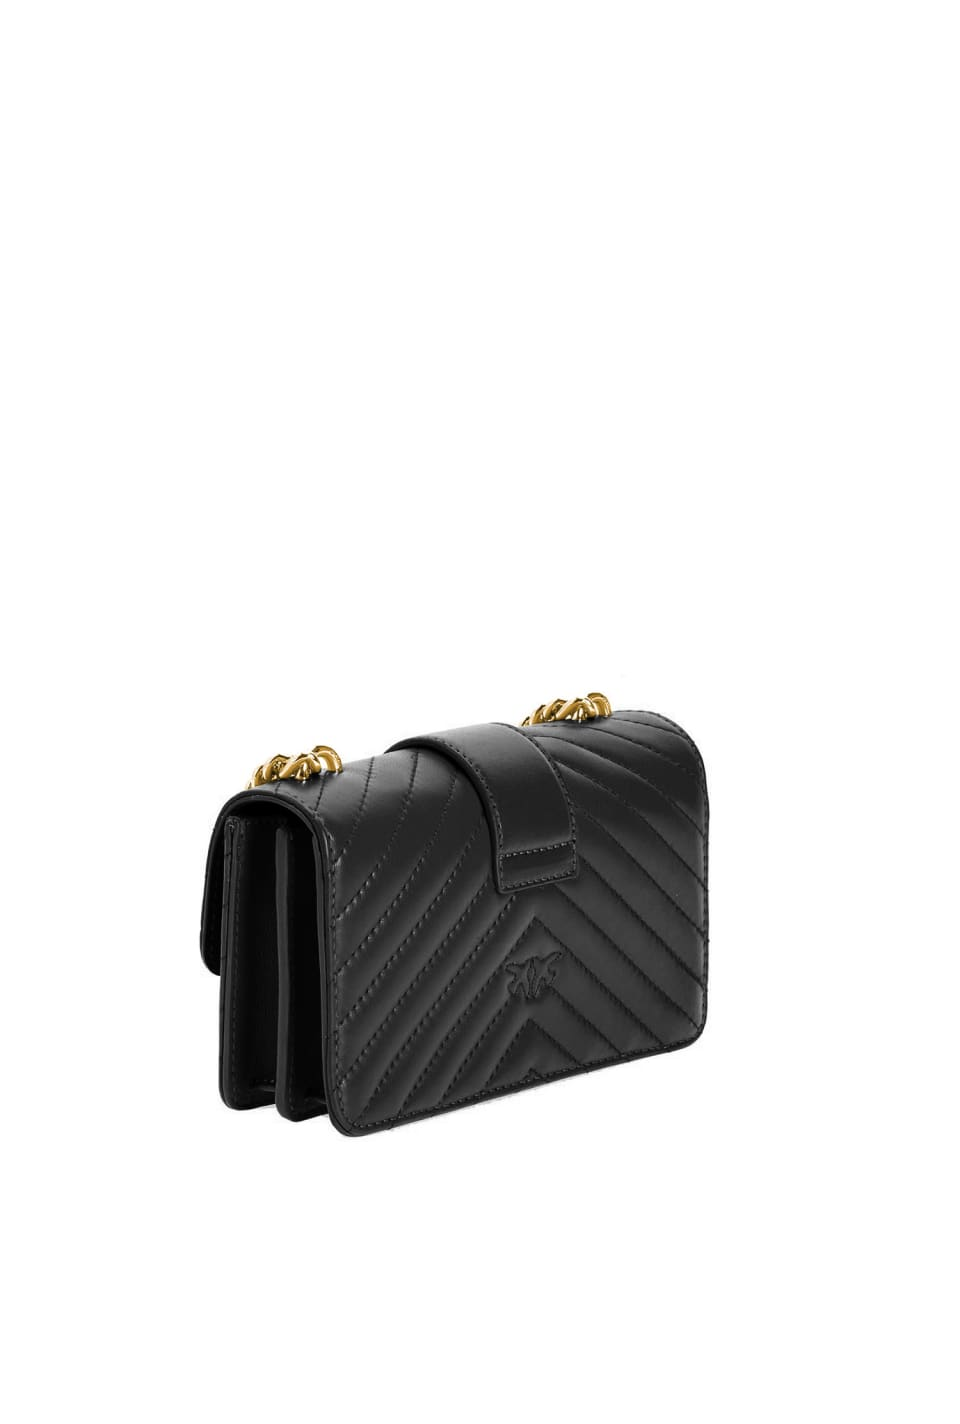 Mini Love Bag Mix in nappa leather